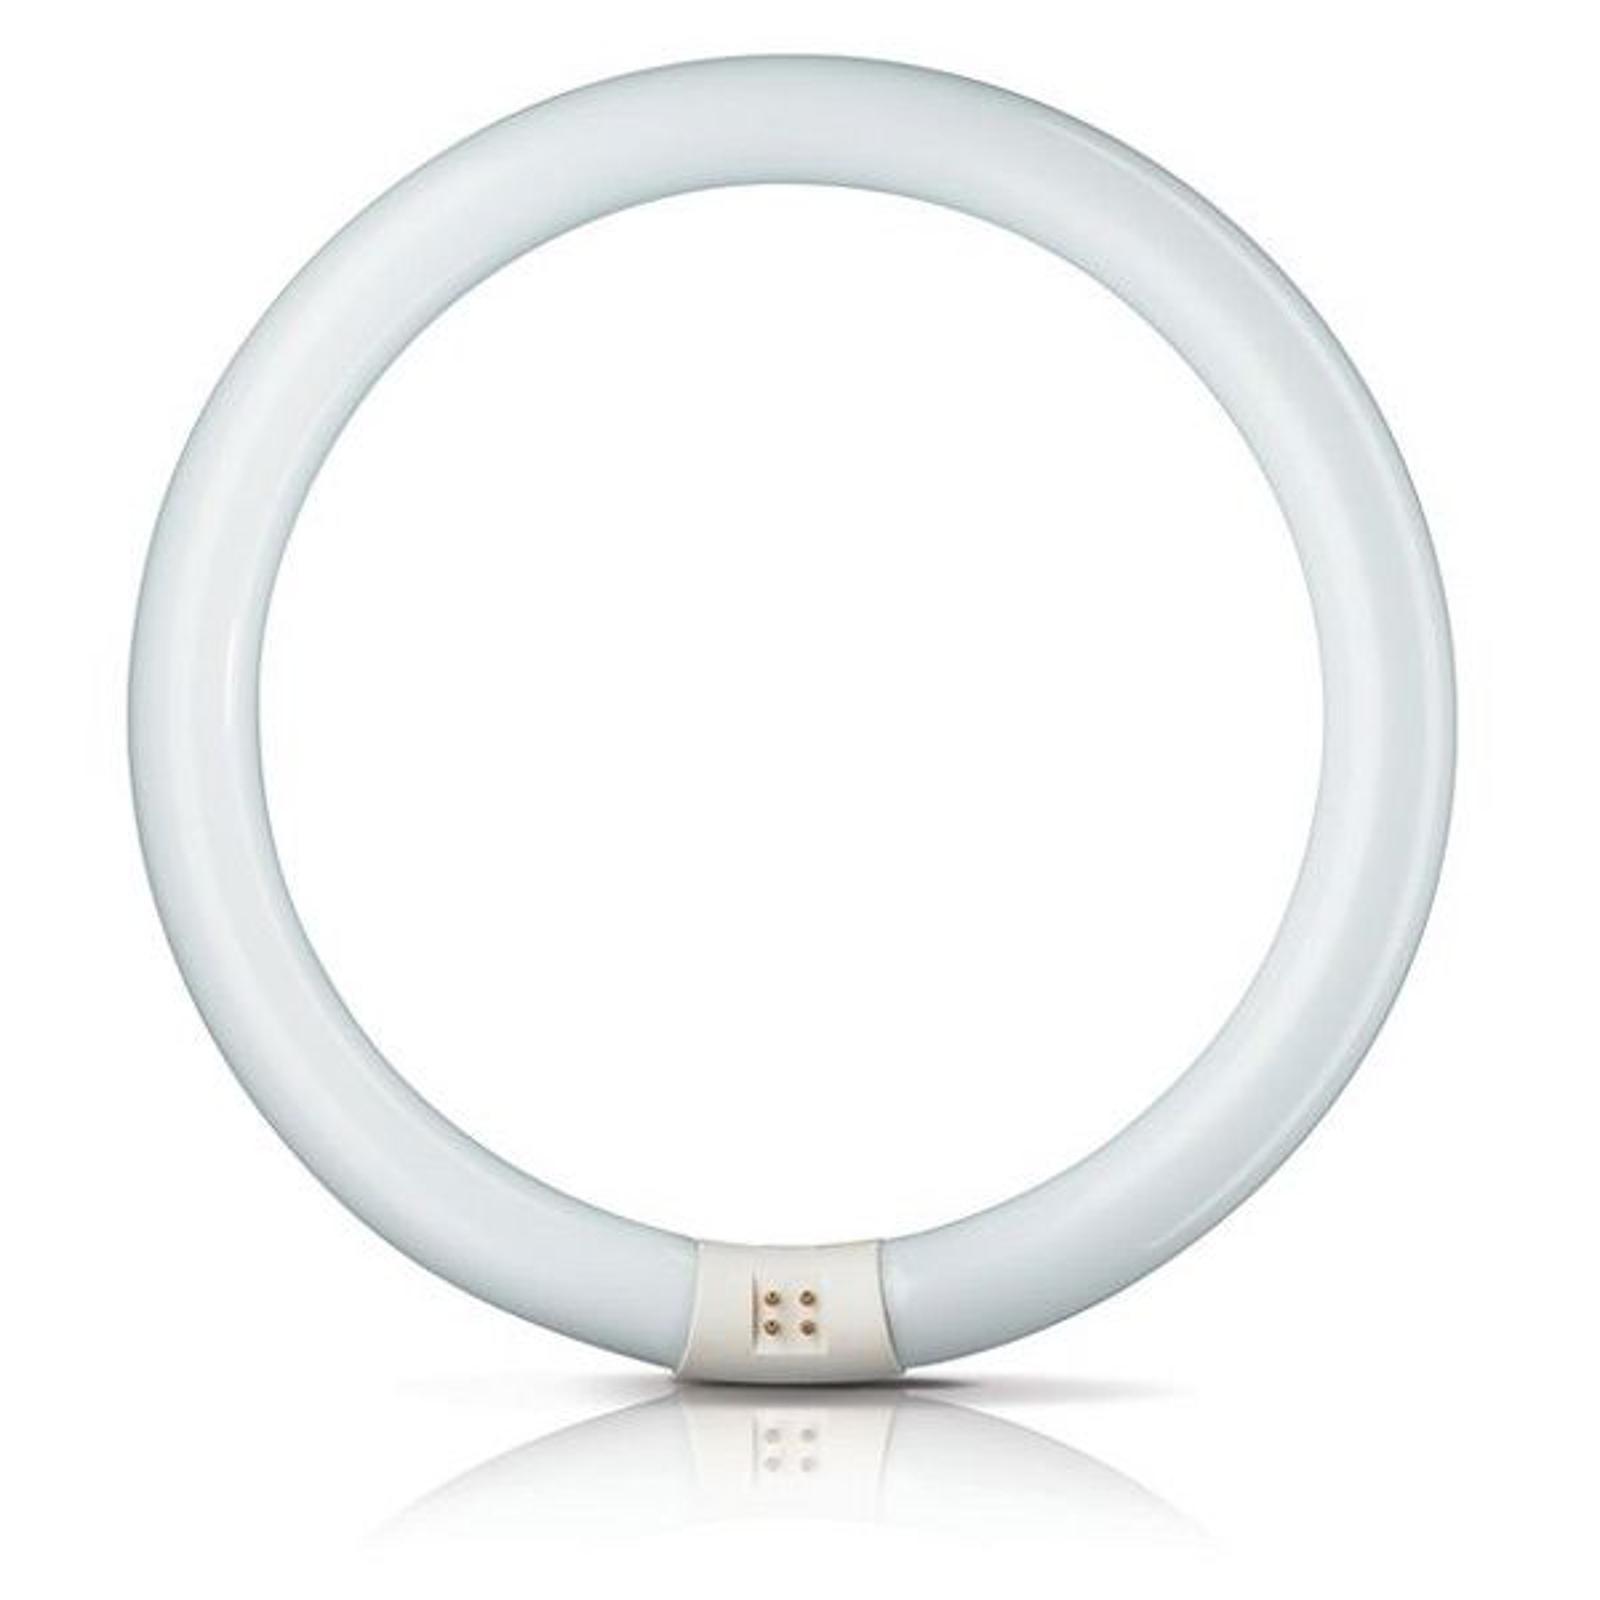 G10q 22W 840 Leuchtstoffring Master Circular TL-E